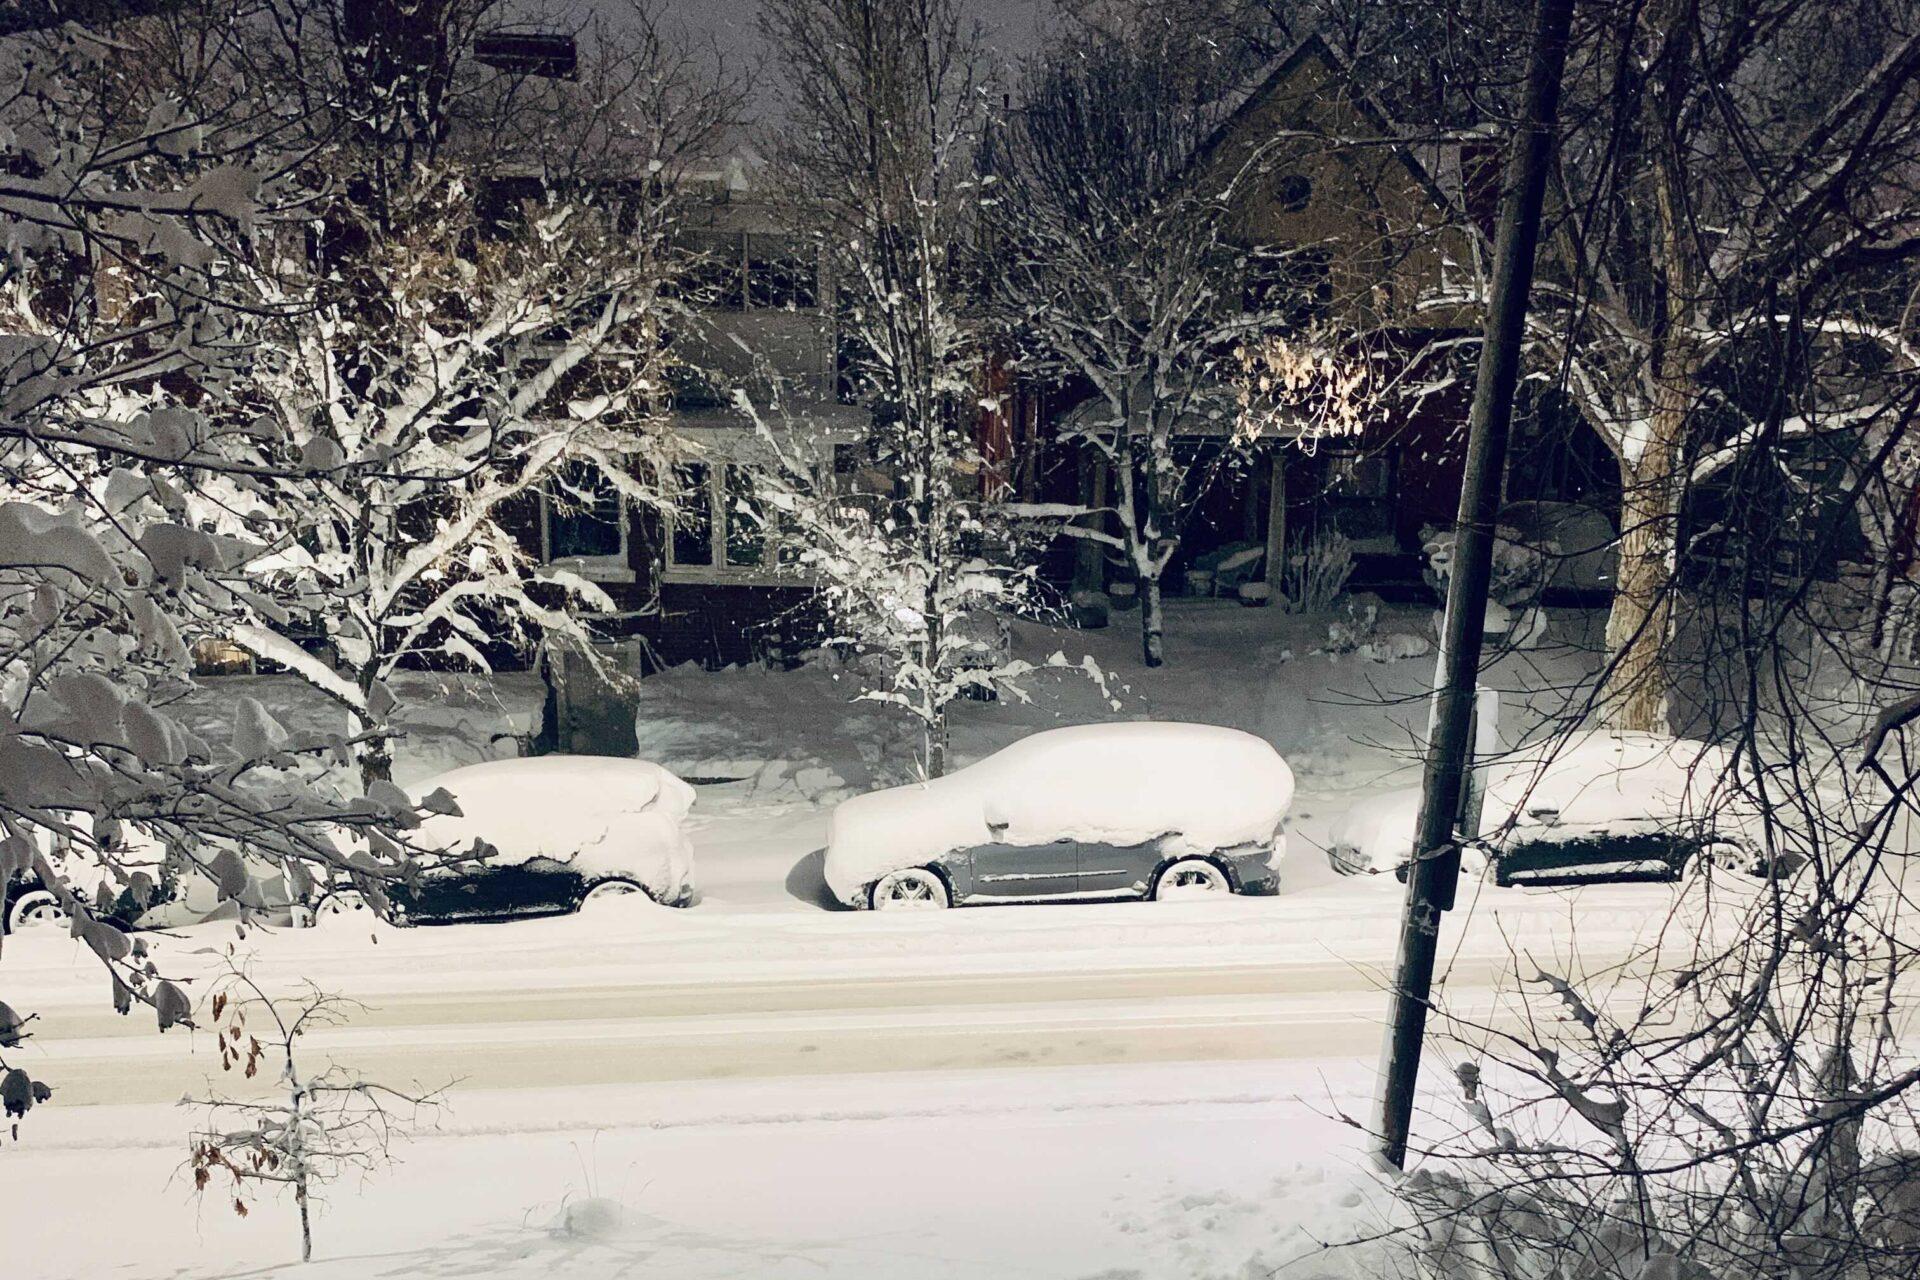 Snow Denver March 14 2021